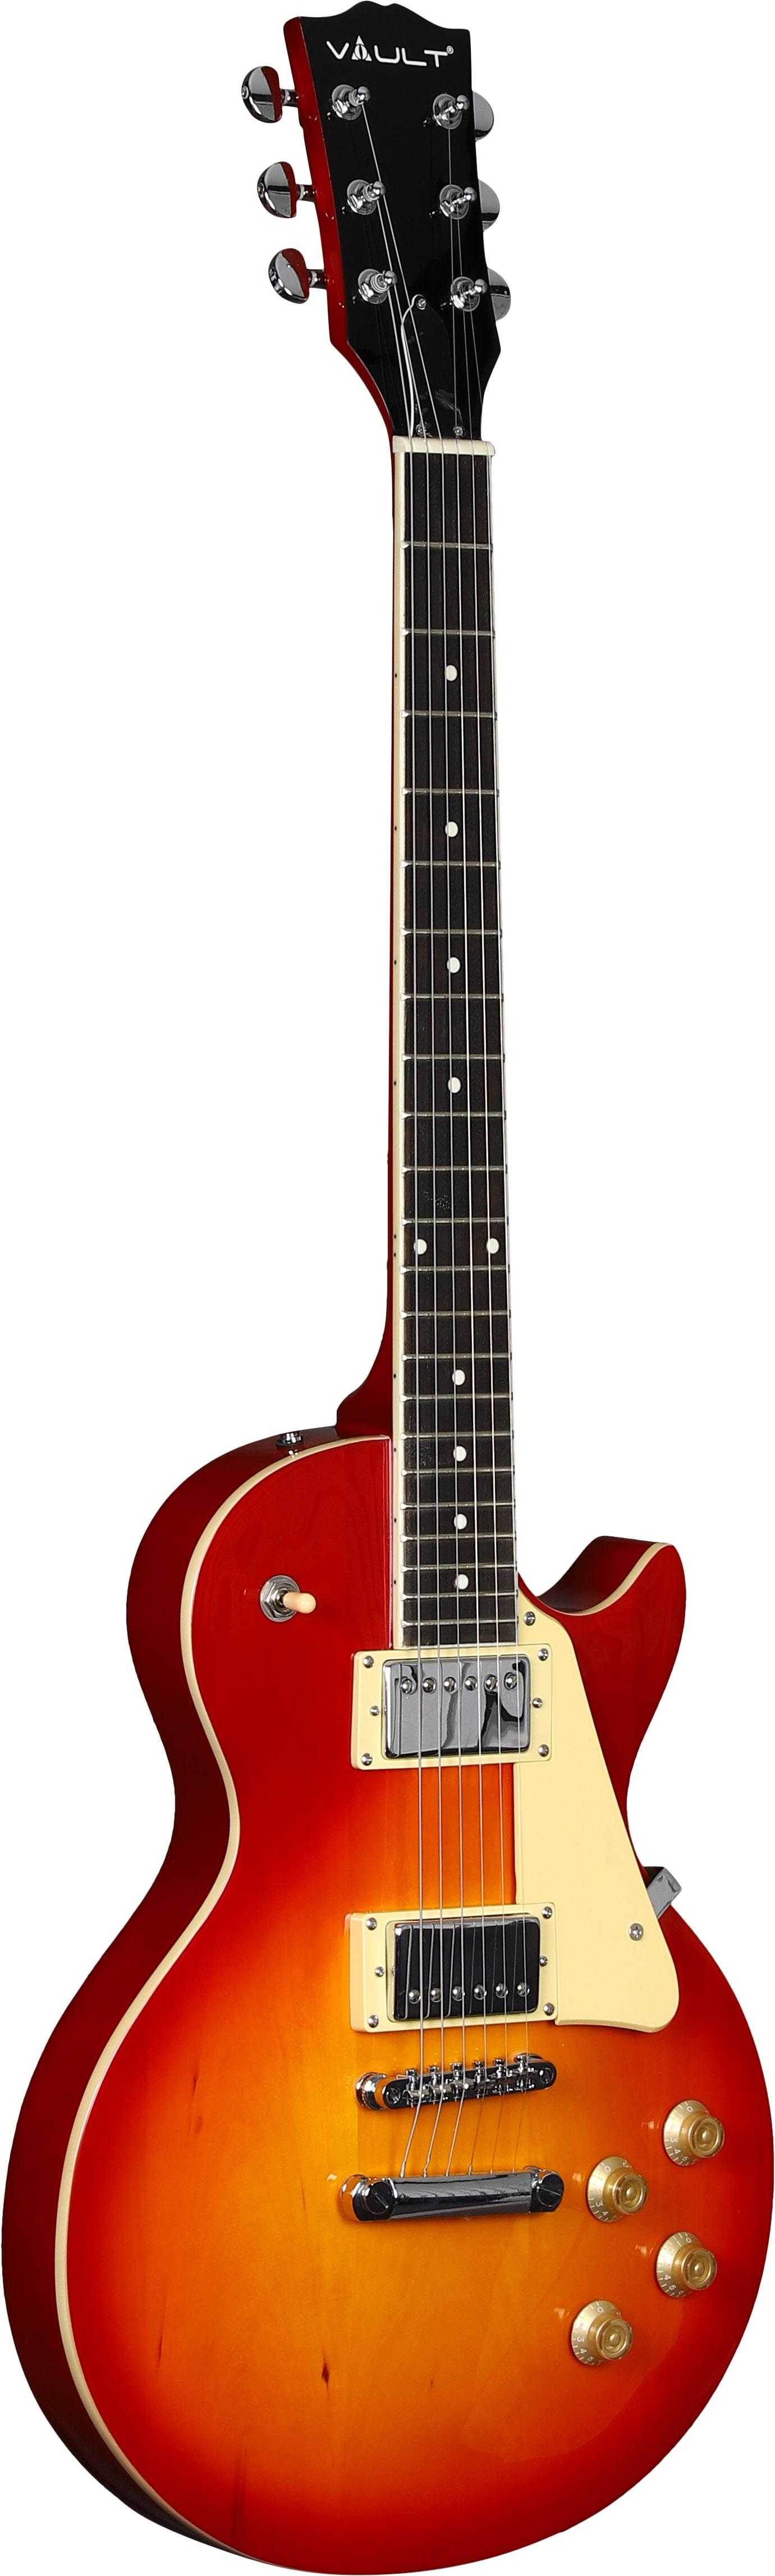 Vault-LP1-Ovangkol-Fretboard-Electric-Guitar-Cherry-Red-Burst-w-Amplifier thumbnail 3